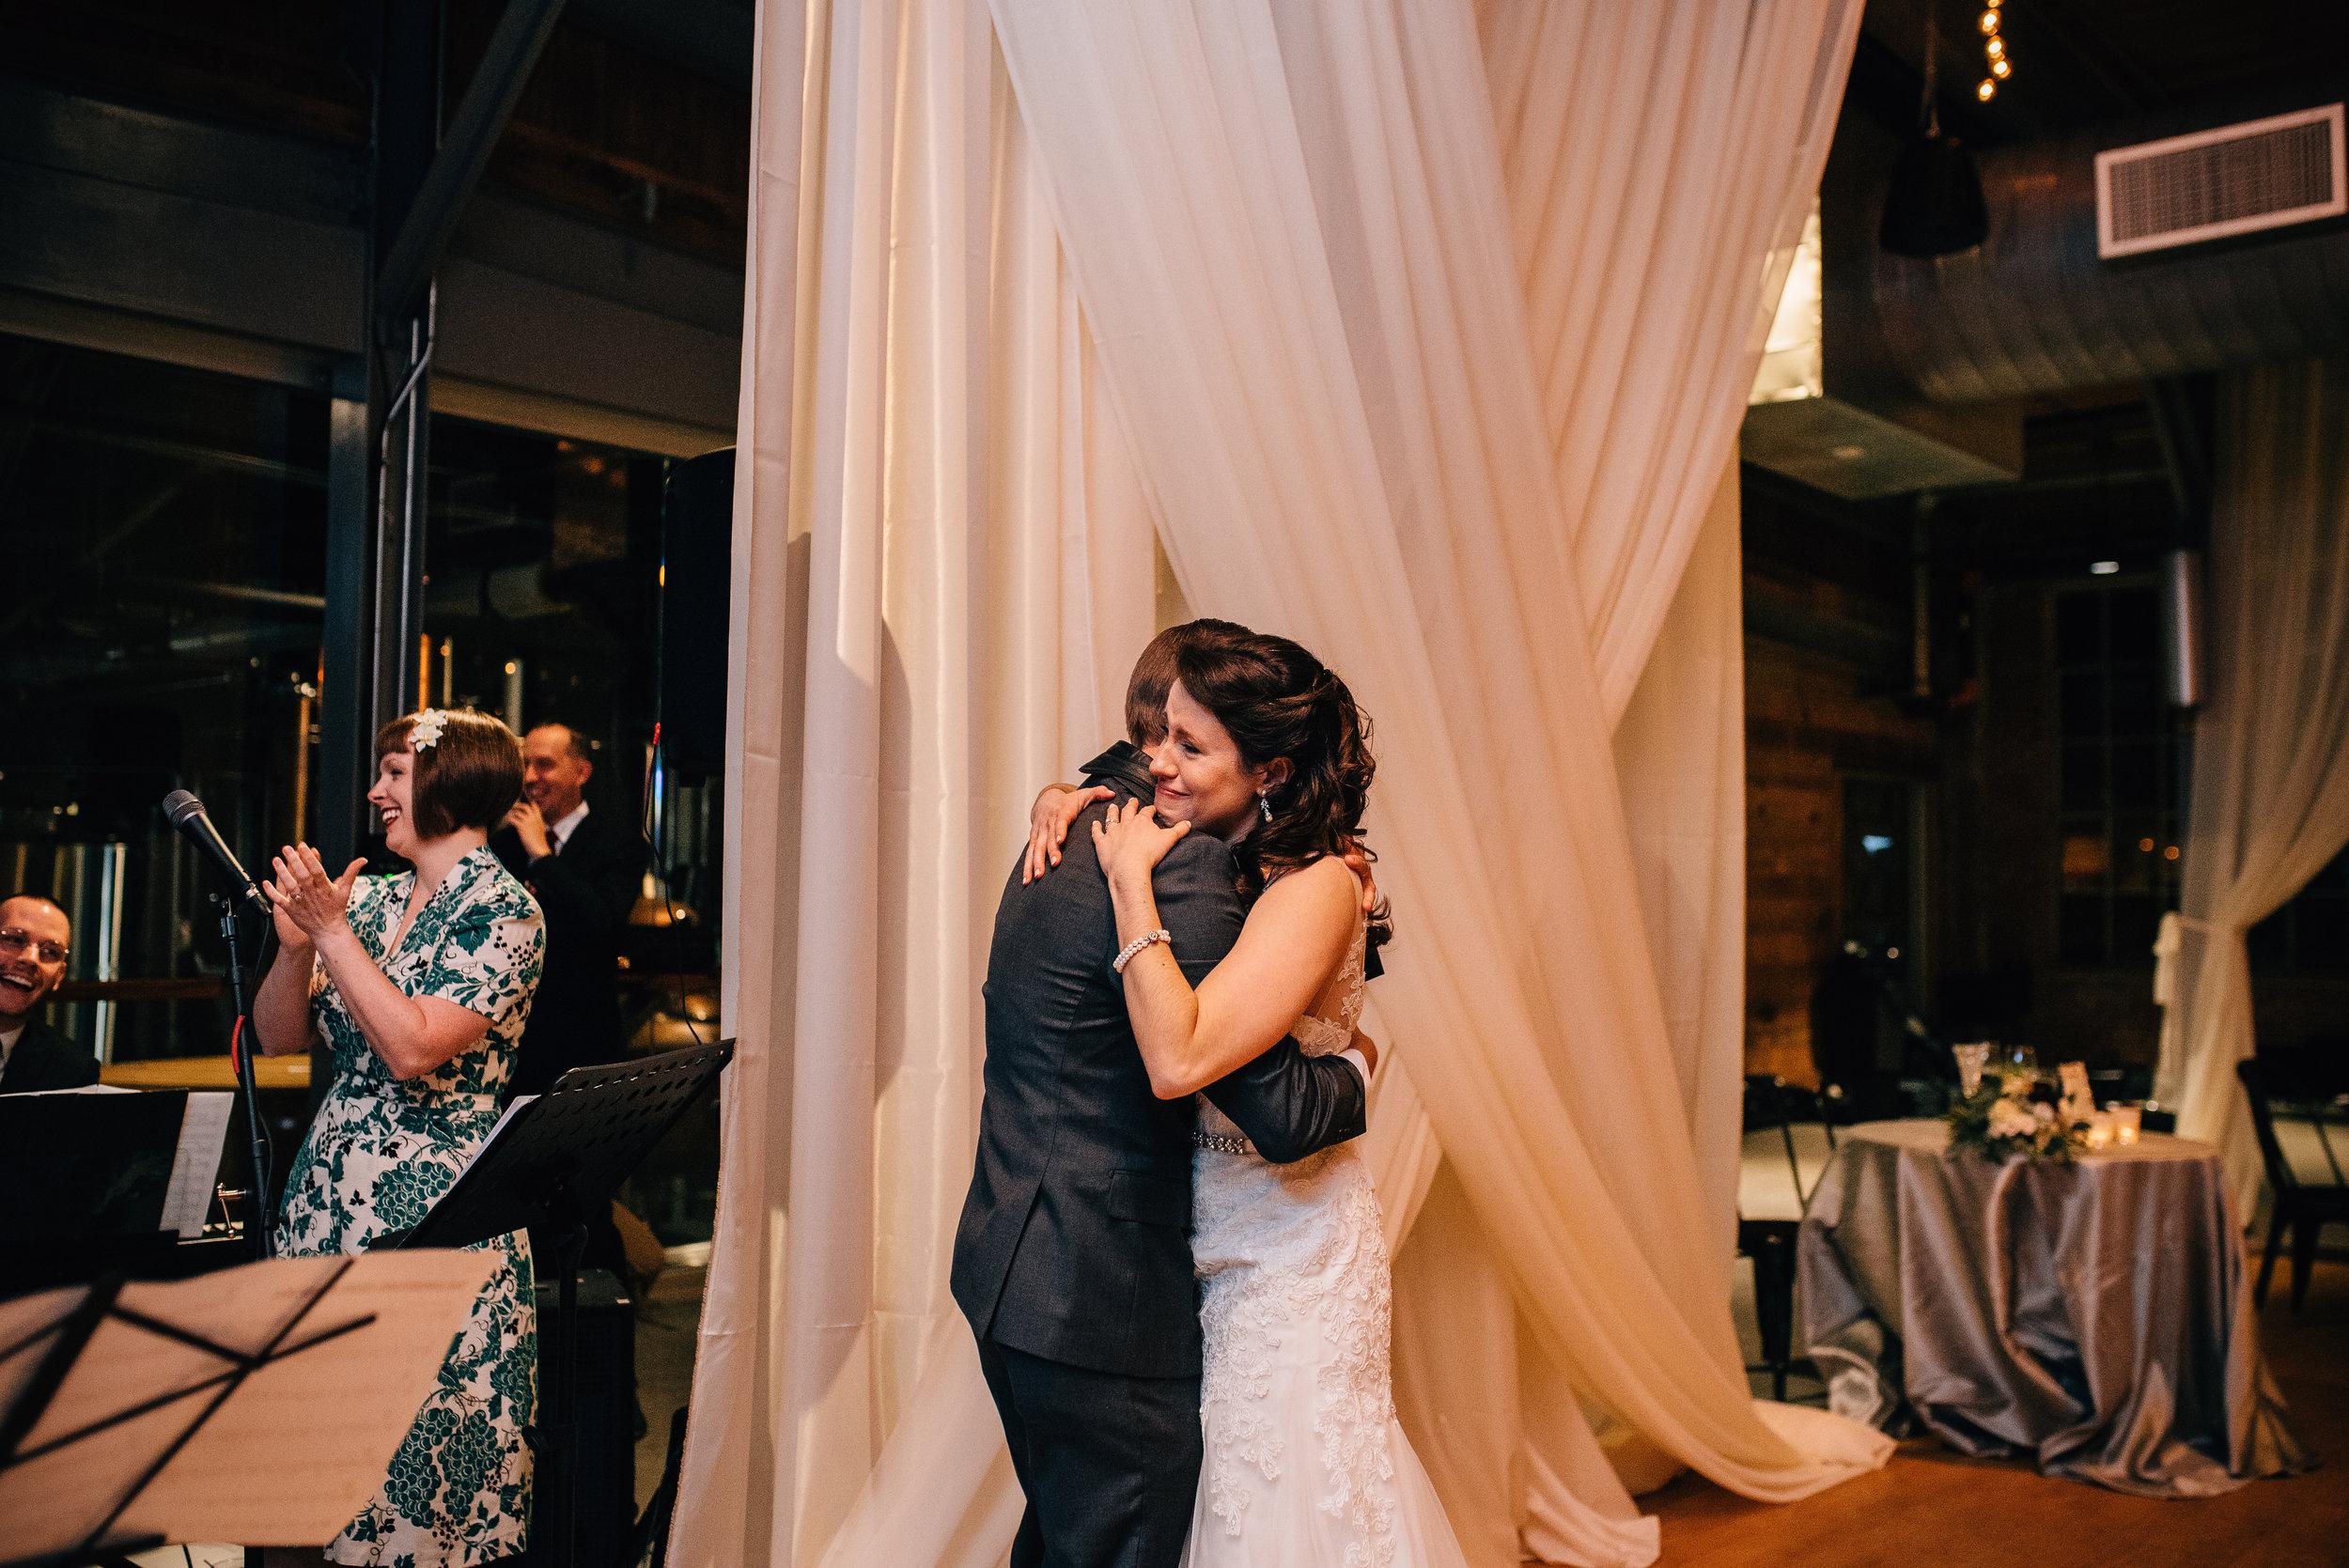 north carolina wedding photographer - the rickhouse wedding - durham wedding photographer